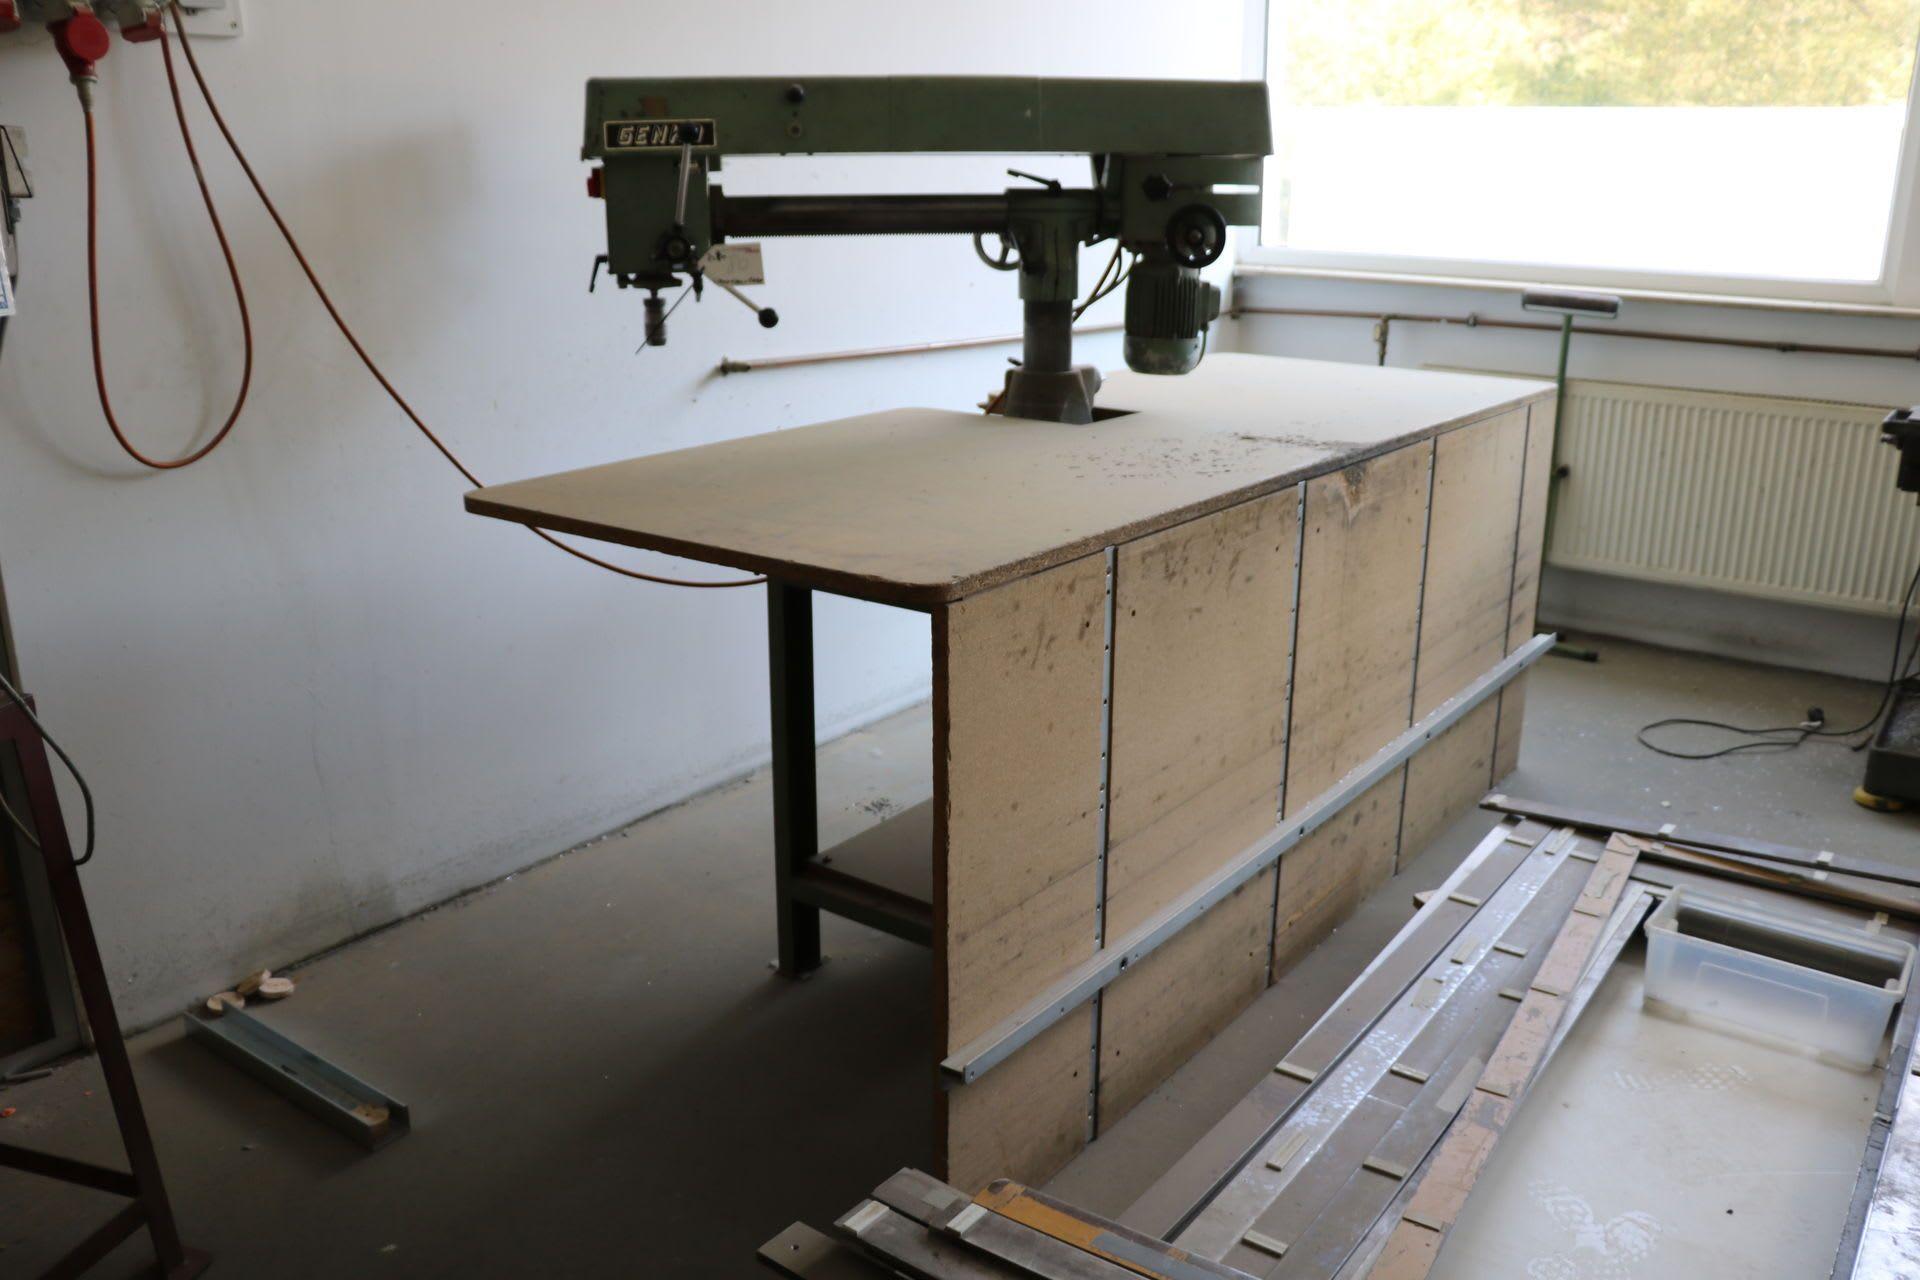 GENKO ATB 21 Radialbohrmaschine